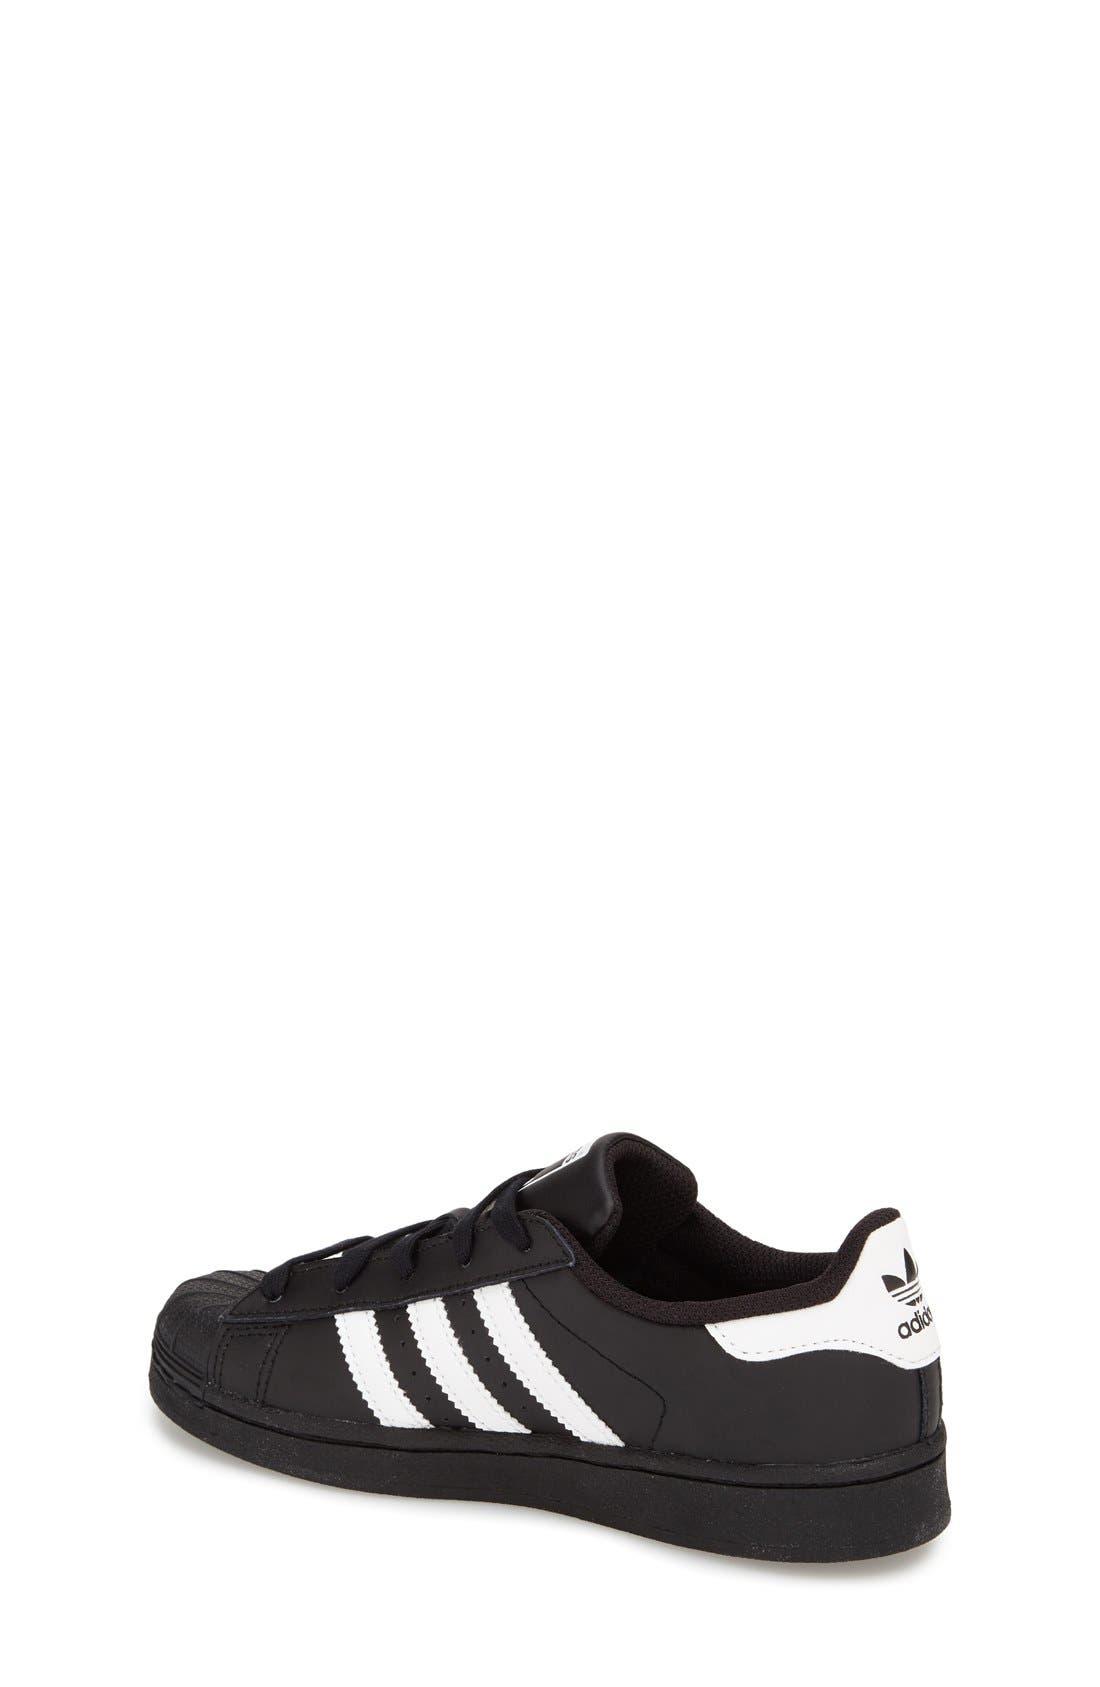 Alternate Image 4  - adidas 'Superstar' Sneaker (Baby, Walker, Toddler, Little Kid & Big Kid)